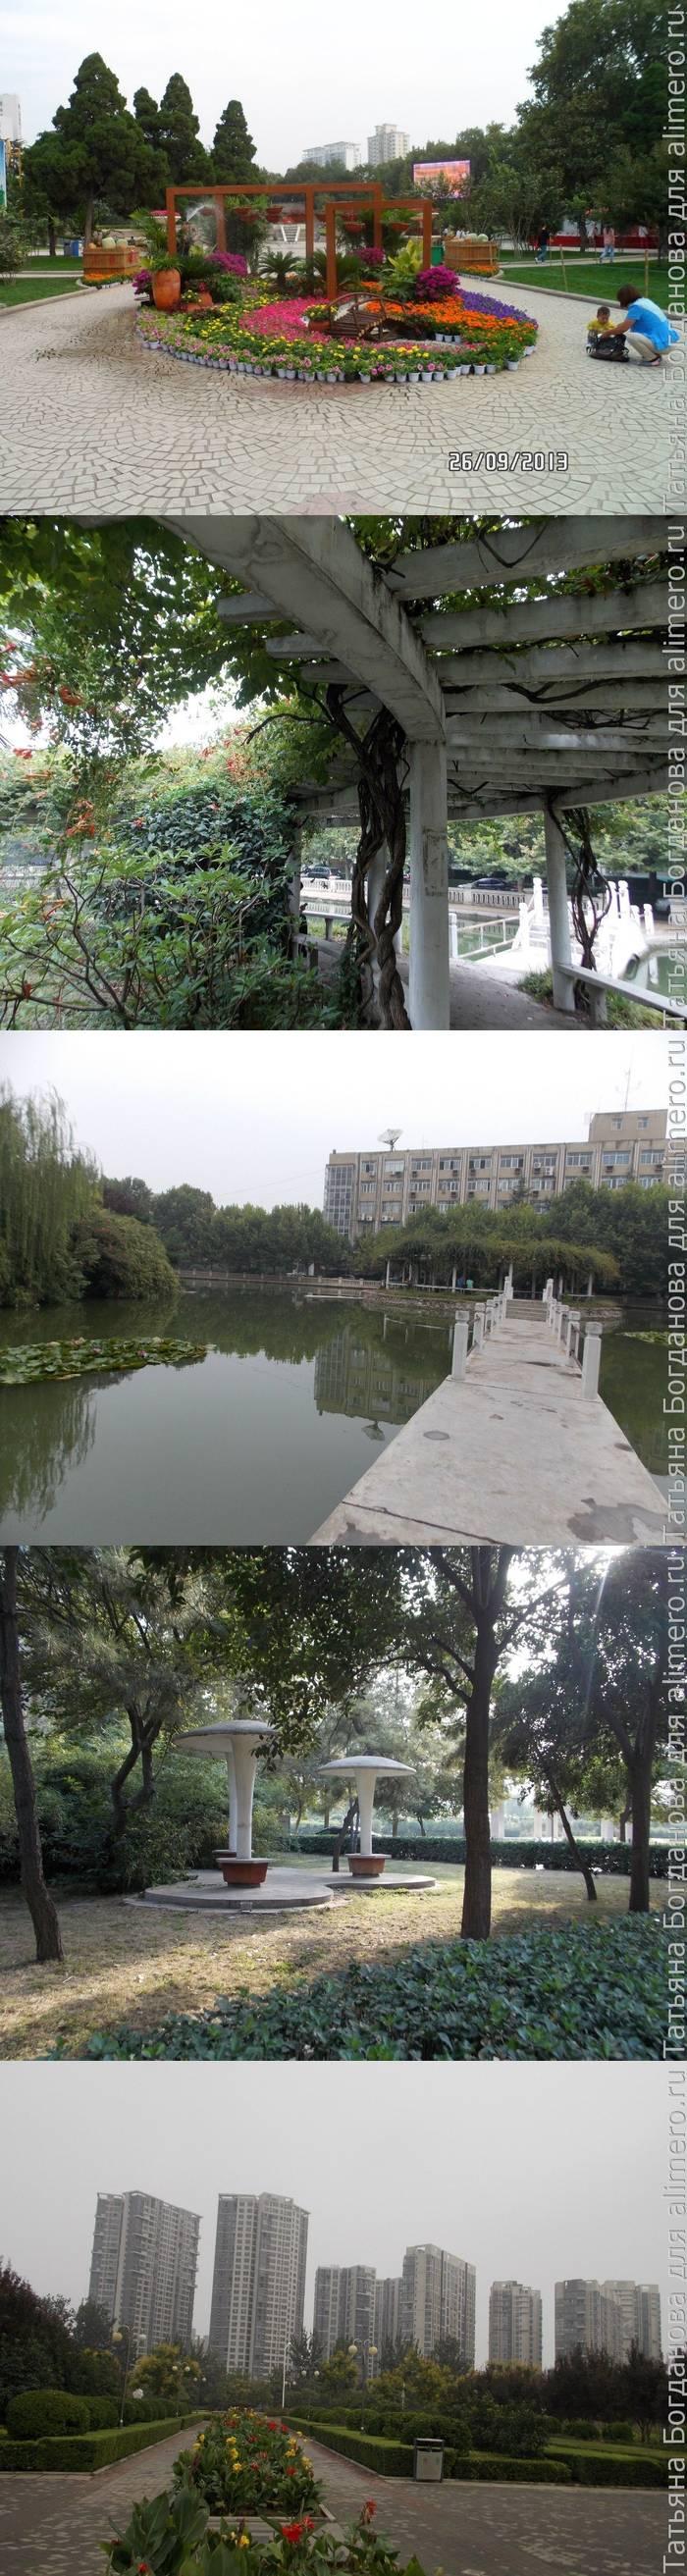 Парки Китая на примере Чжэнчжоу